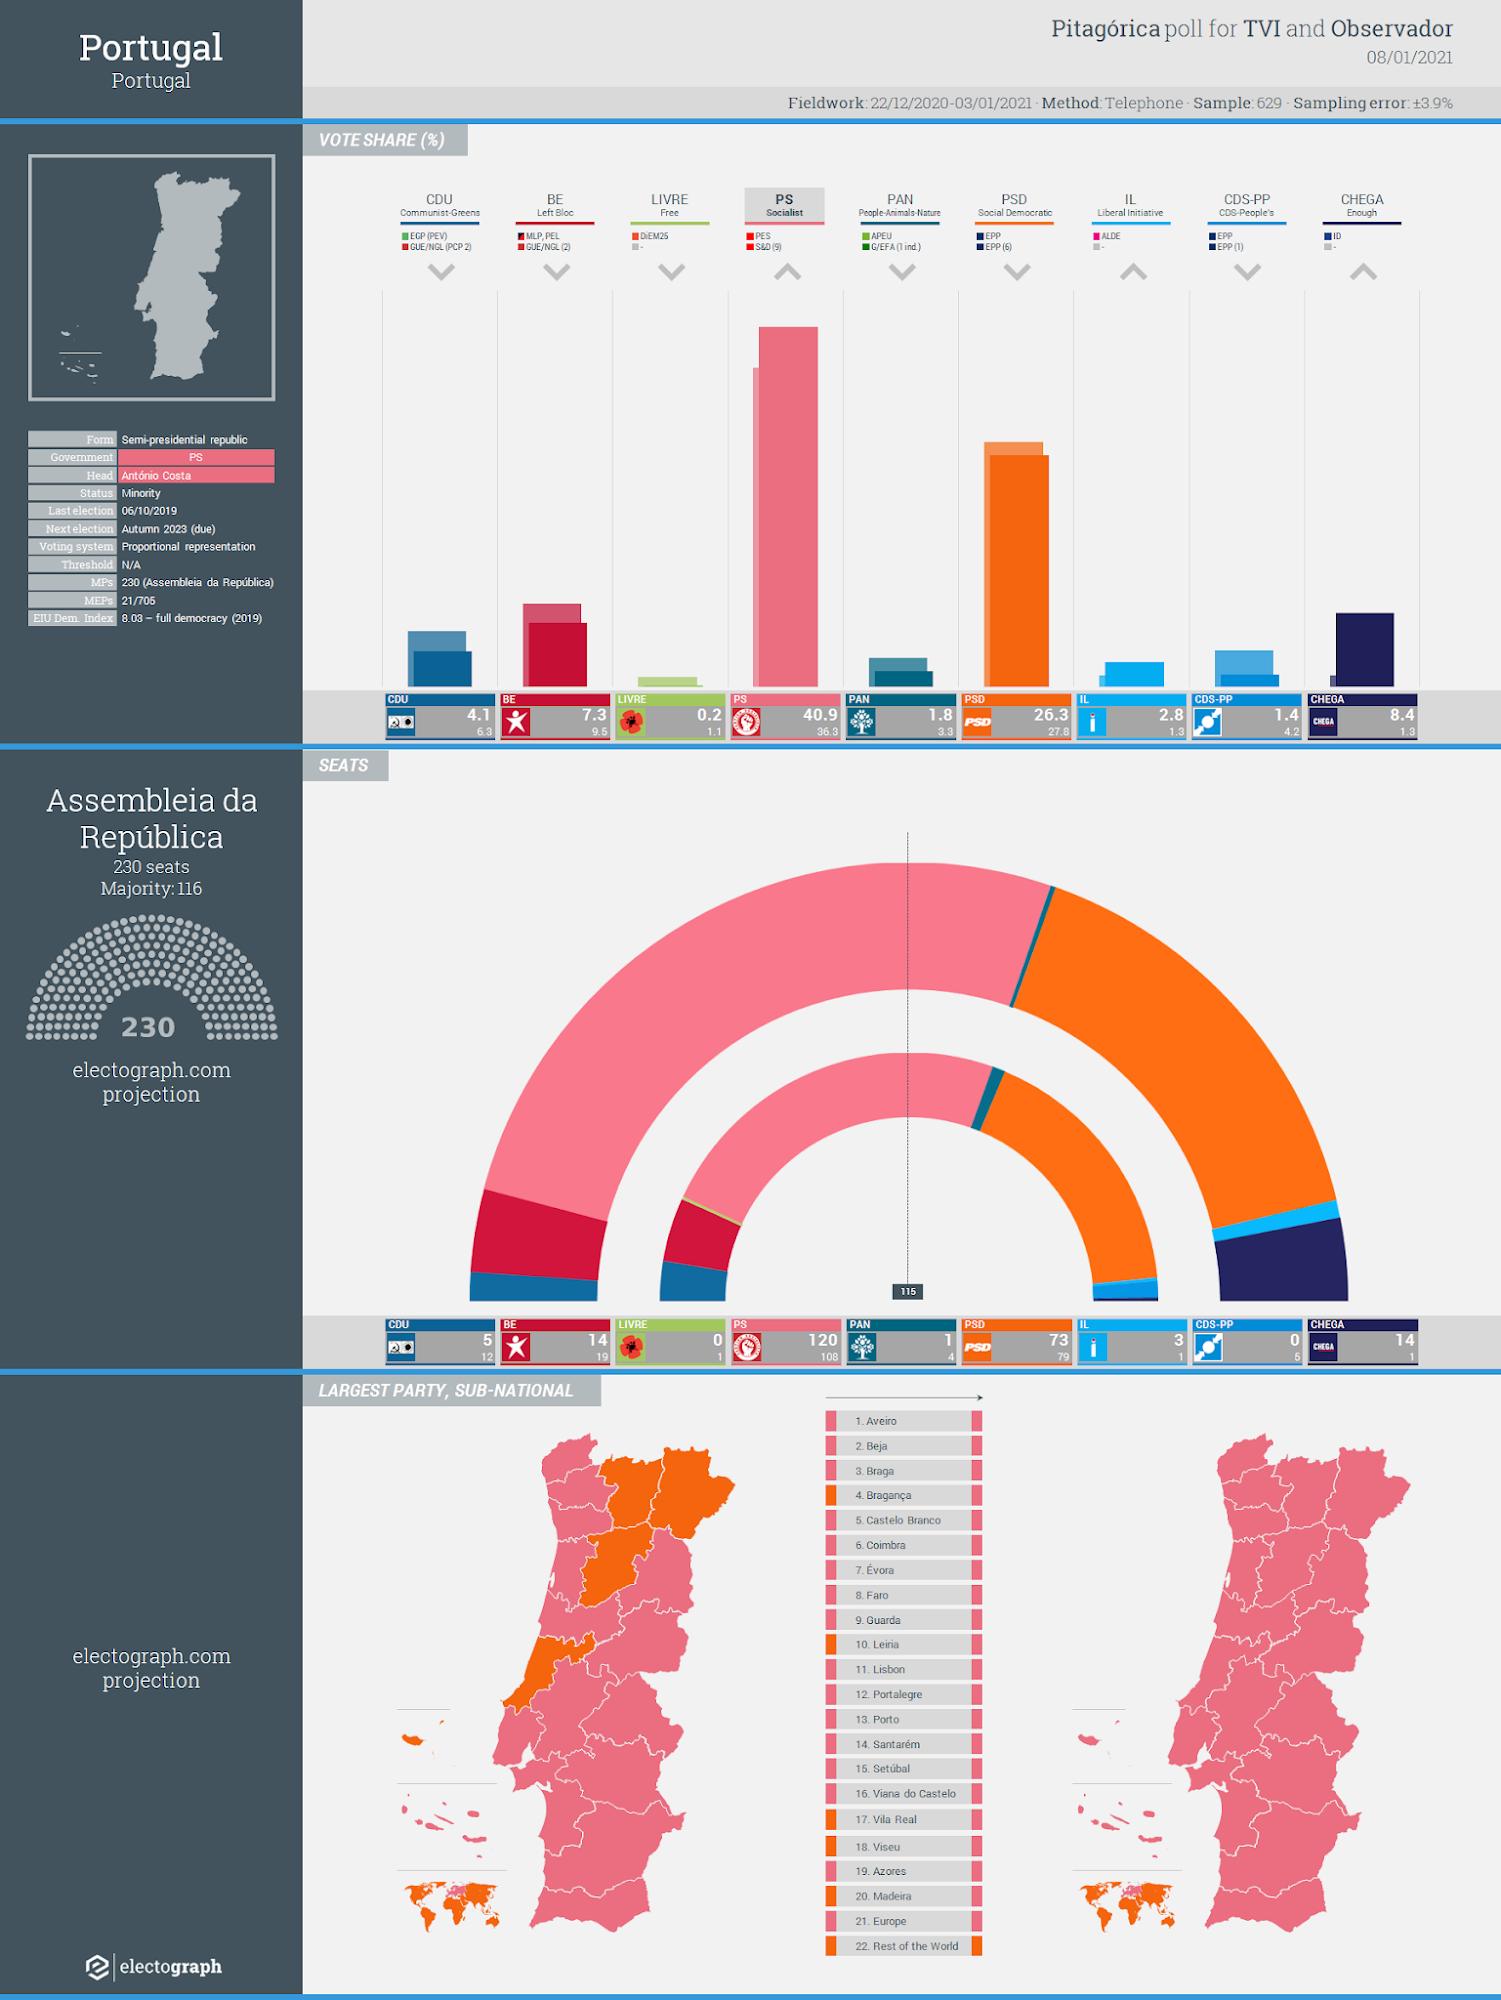 PORTUGAL: Pitagórica poll chart for TVI and Observador, 8 January 2021